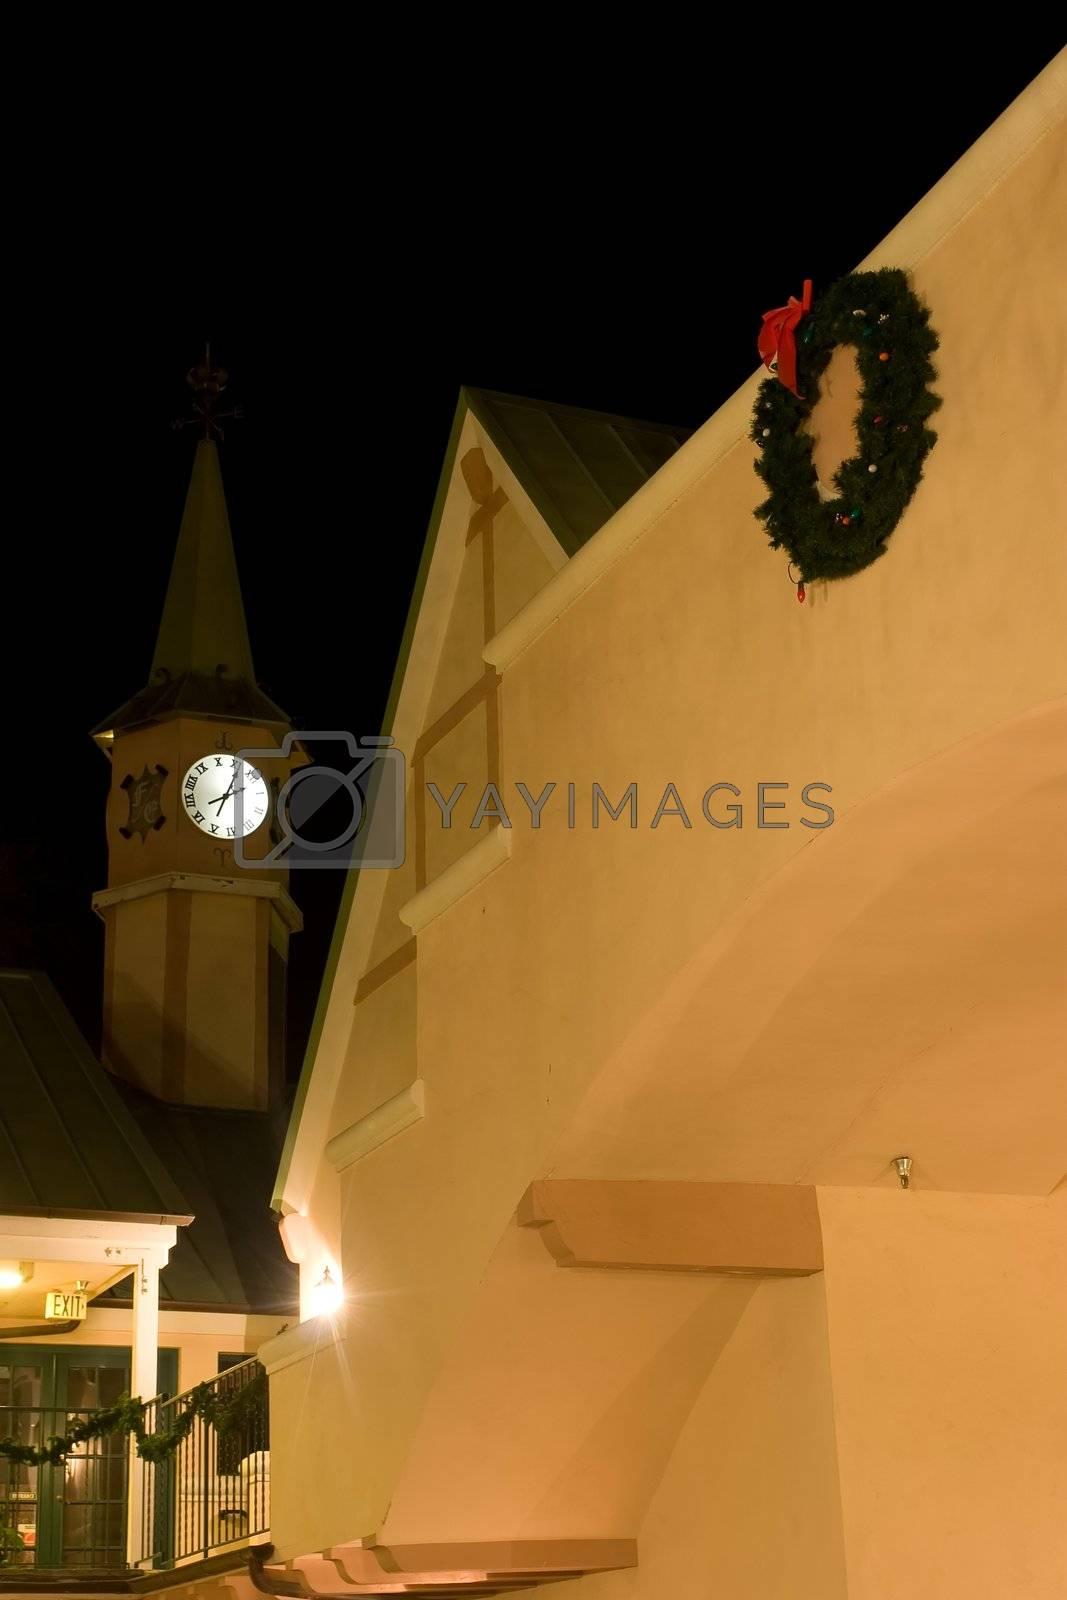 Clock Tower view from Jensens Copenhagen Square in Solvang, California